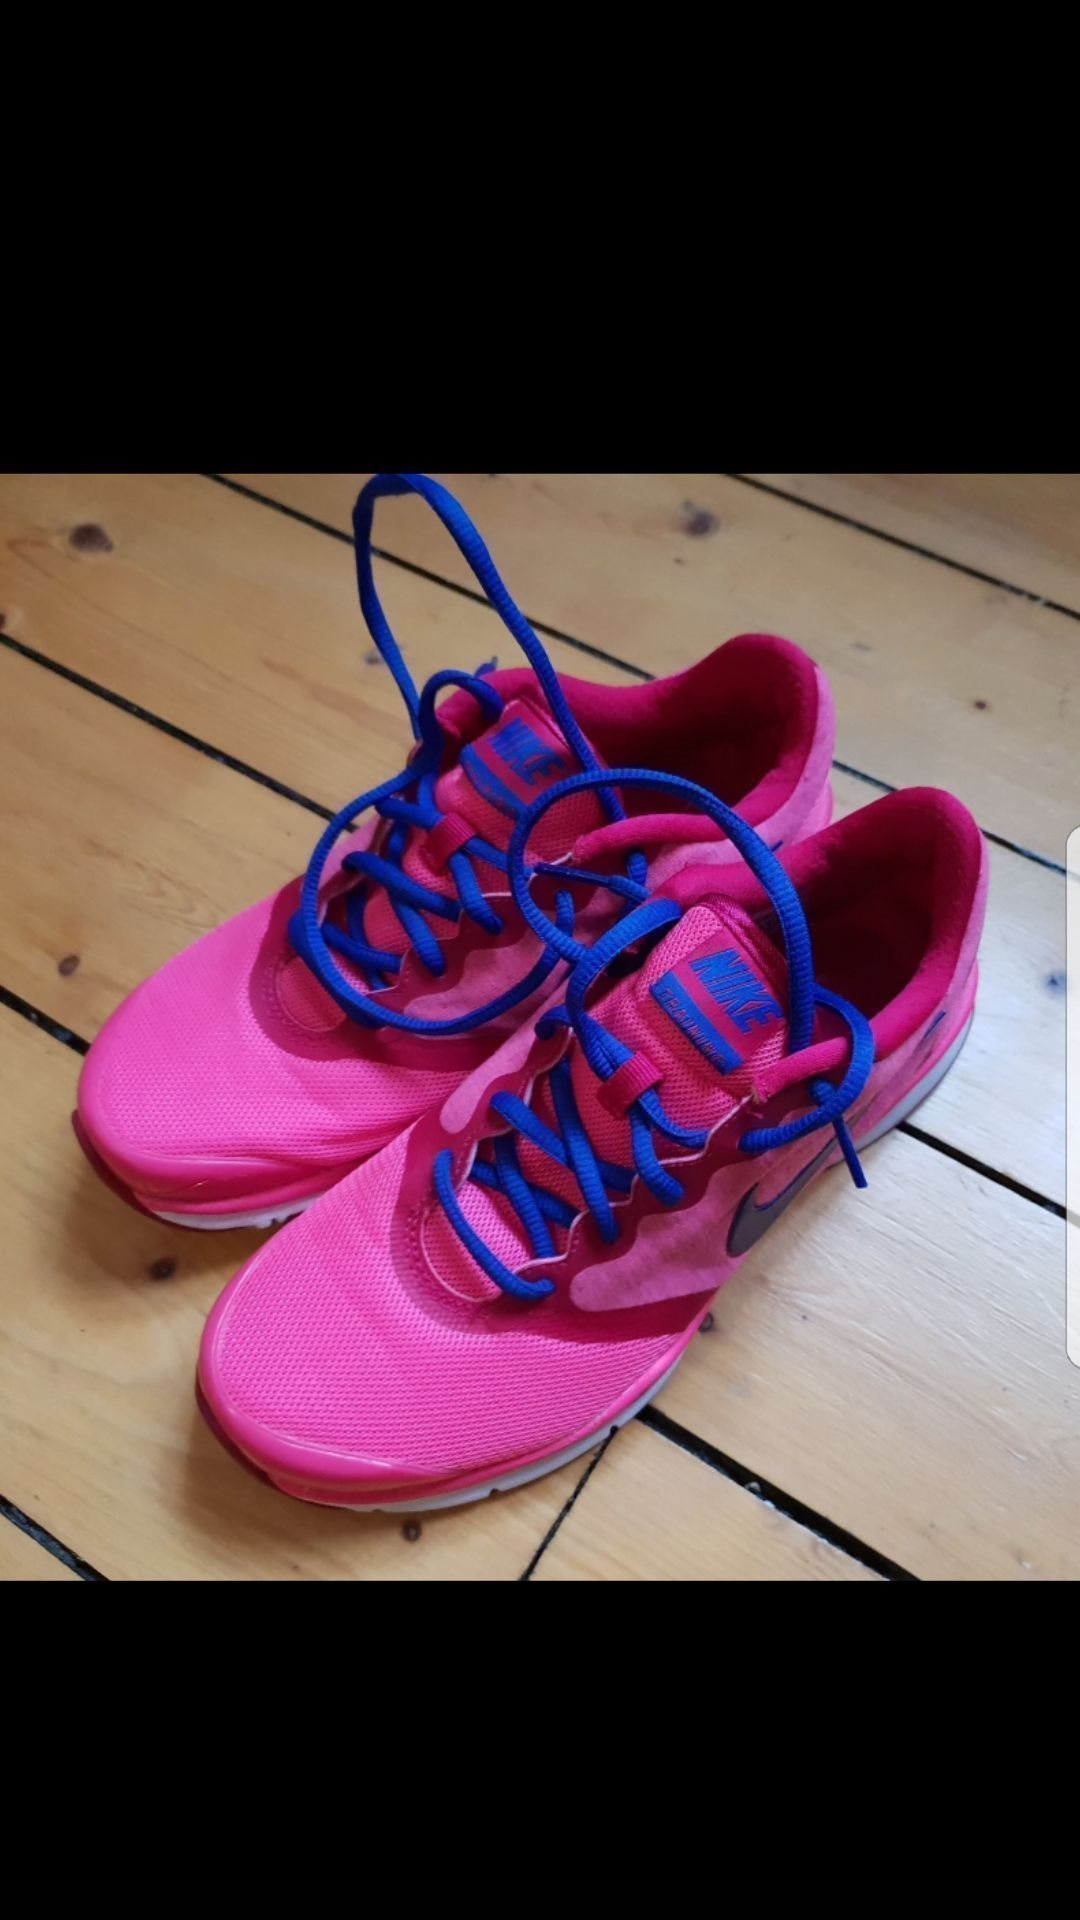 best cheap 40a84 19c57 Nikeskor  träningsskor Nike rosa storlek 37,5 (som 37) , fint skick